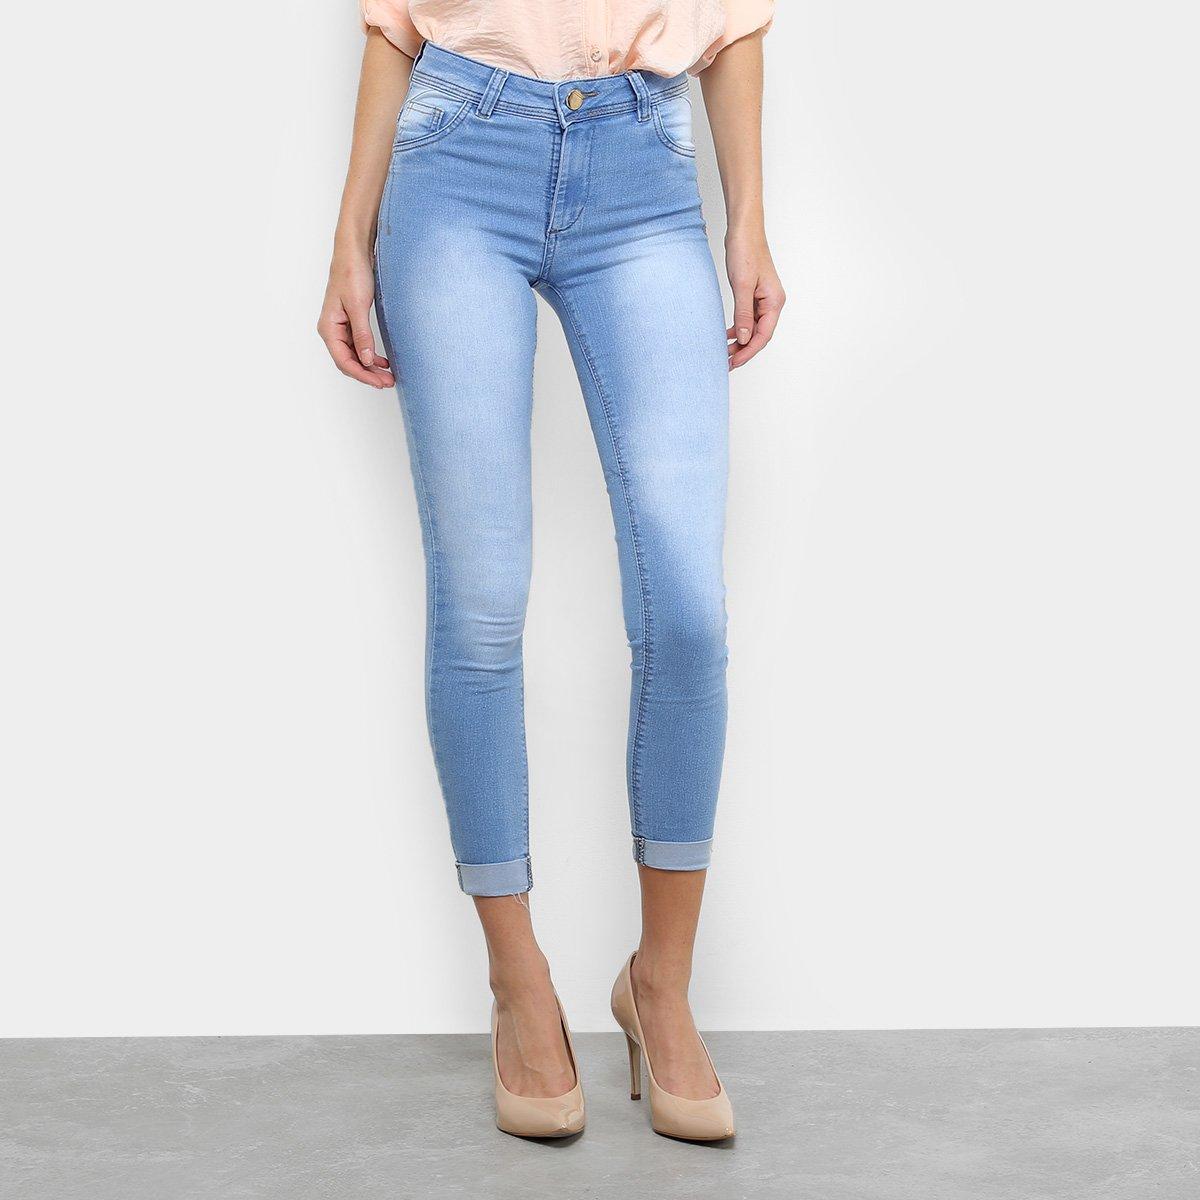 Calça Jeans Skinny Coffee Estonada Cintura Média Feminina